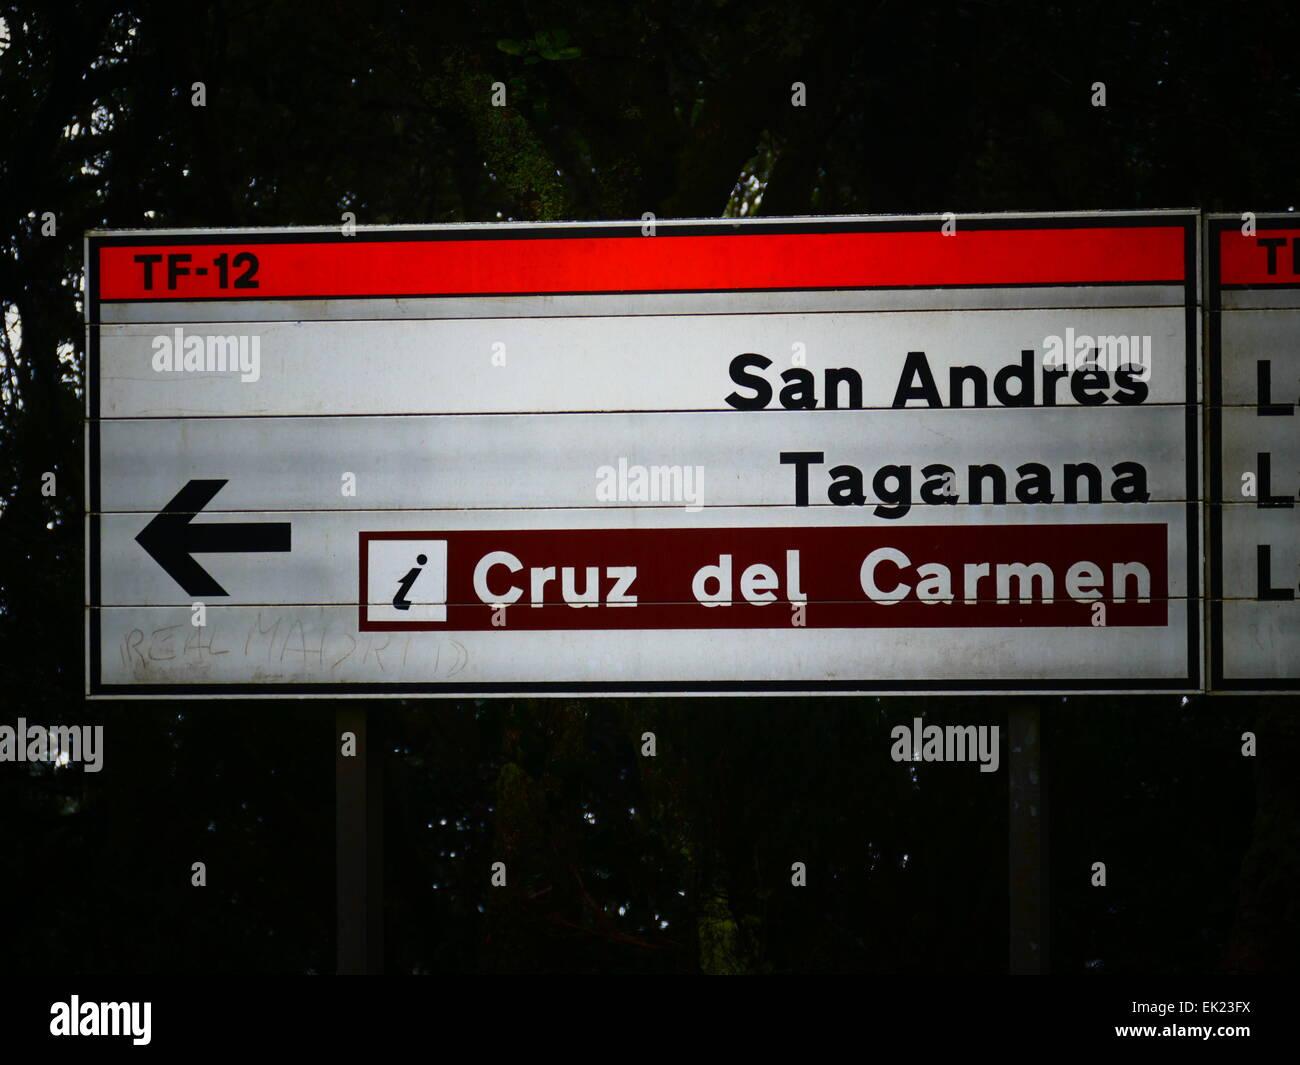 Verkehrszeichen San Andres Las Mercedes Las Canteras La Laguna Teneriffa Insel Kanaren Spanien Stockbild